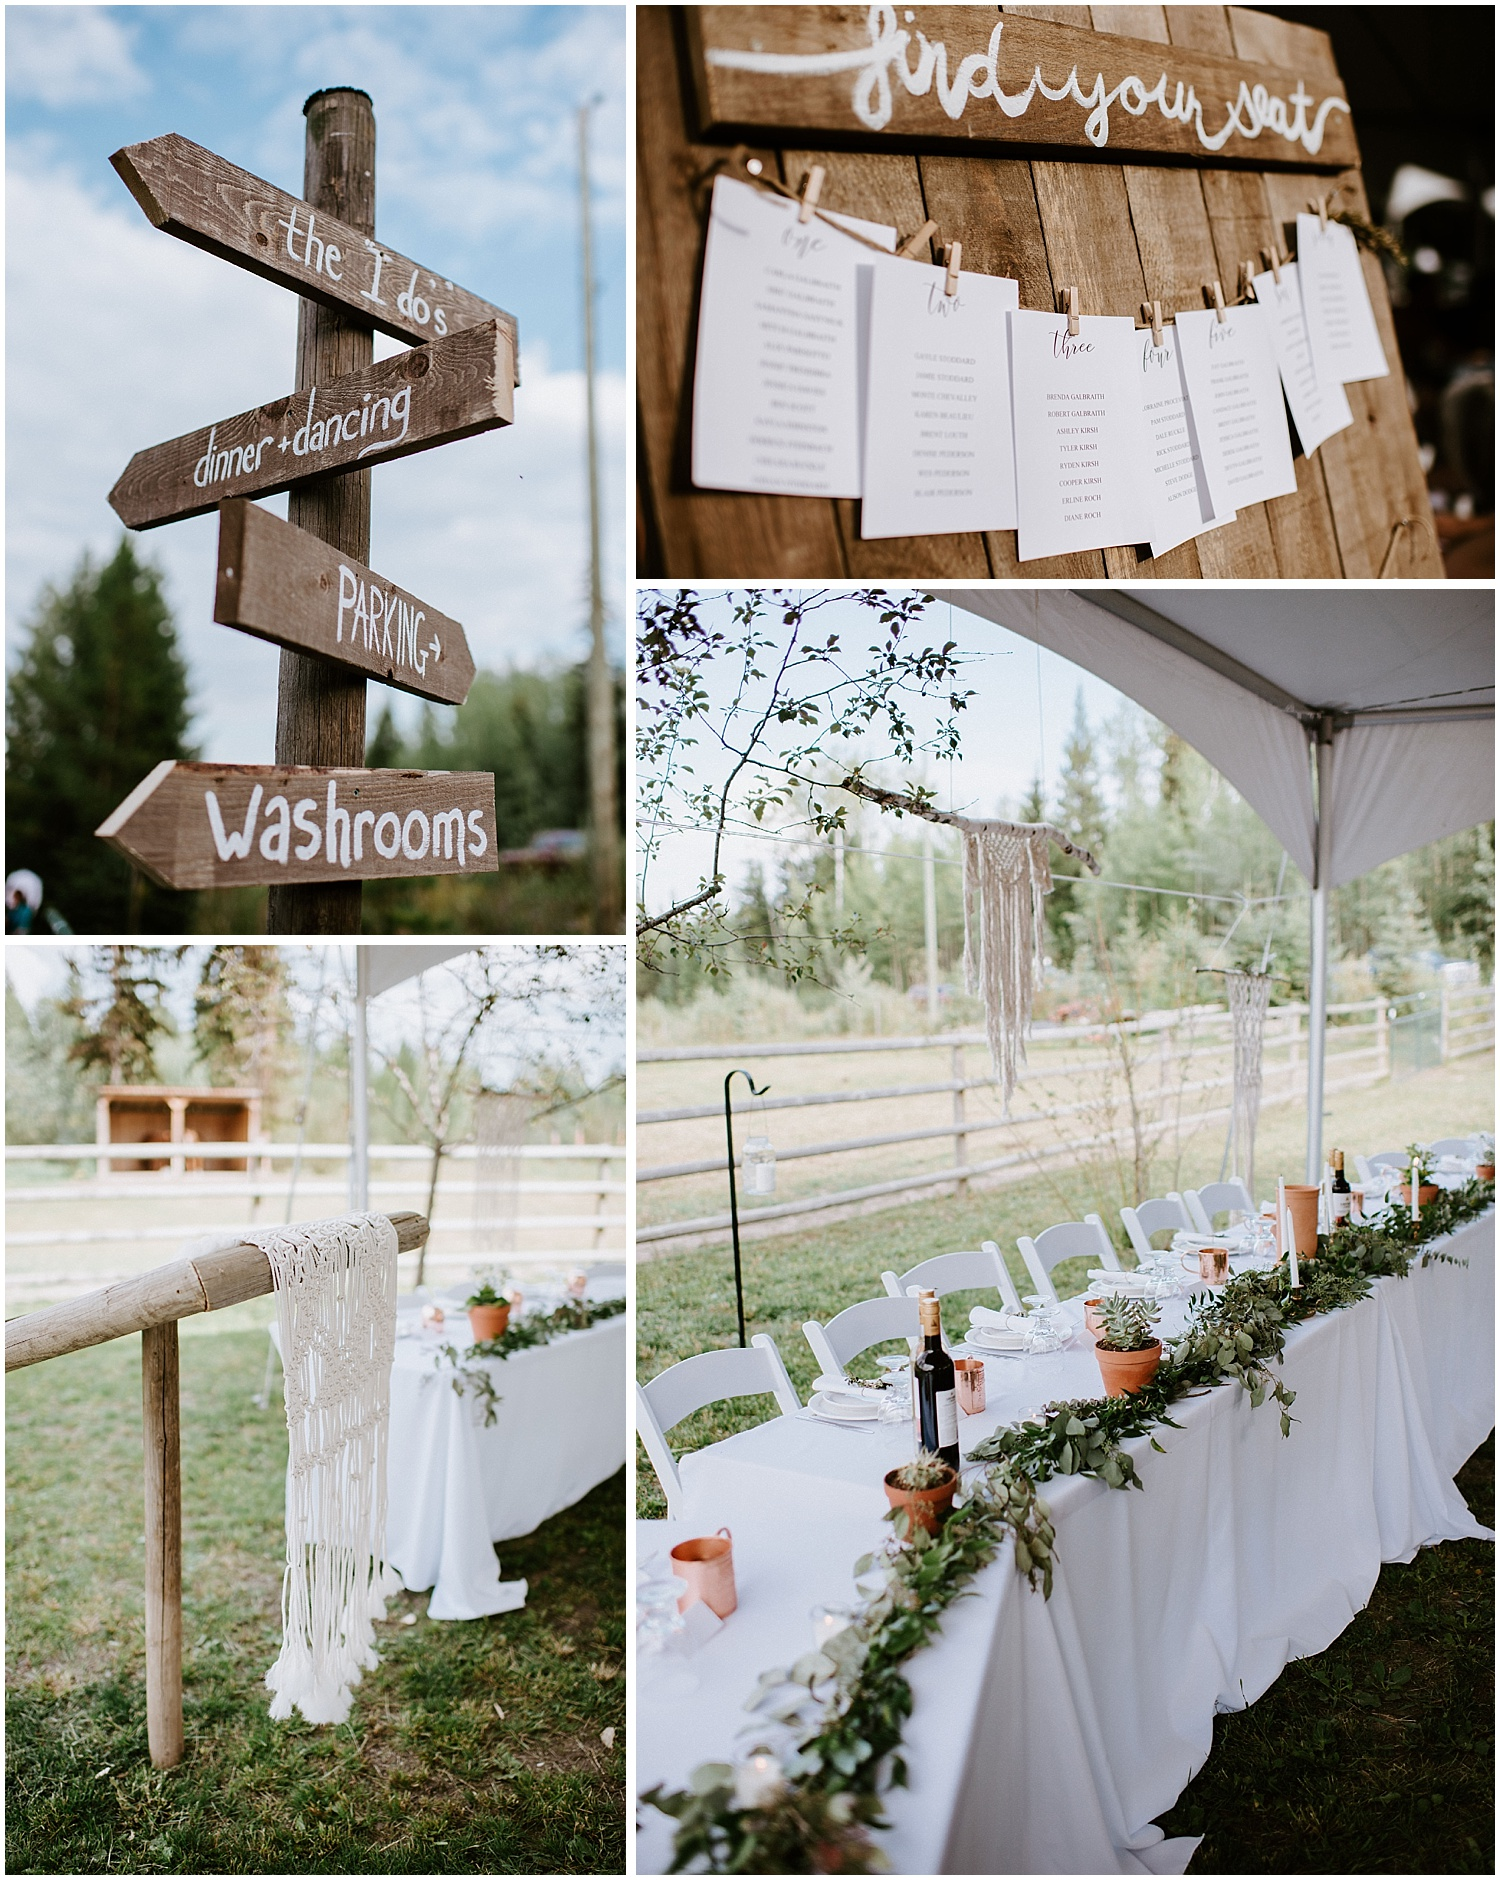 Quesnel_wedding_vancouver_bc_elopement_Pinnacles_Provincial_Park_0229.jpg